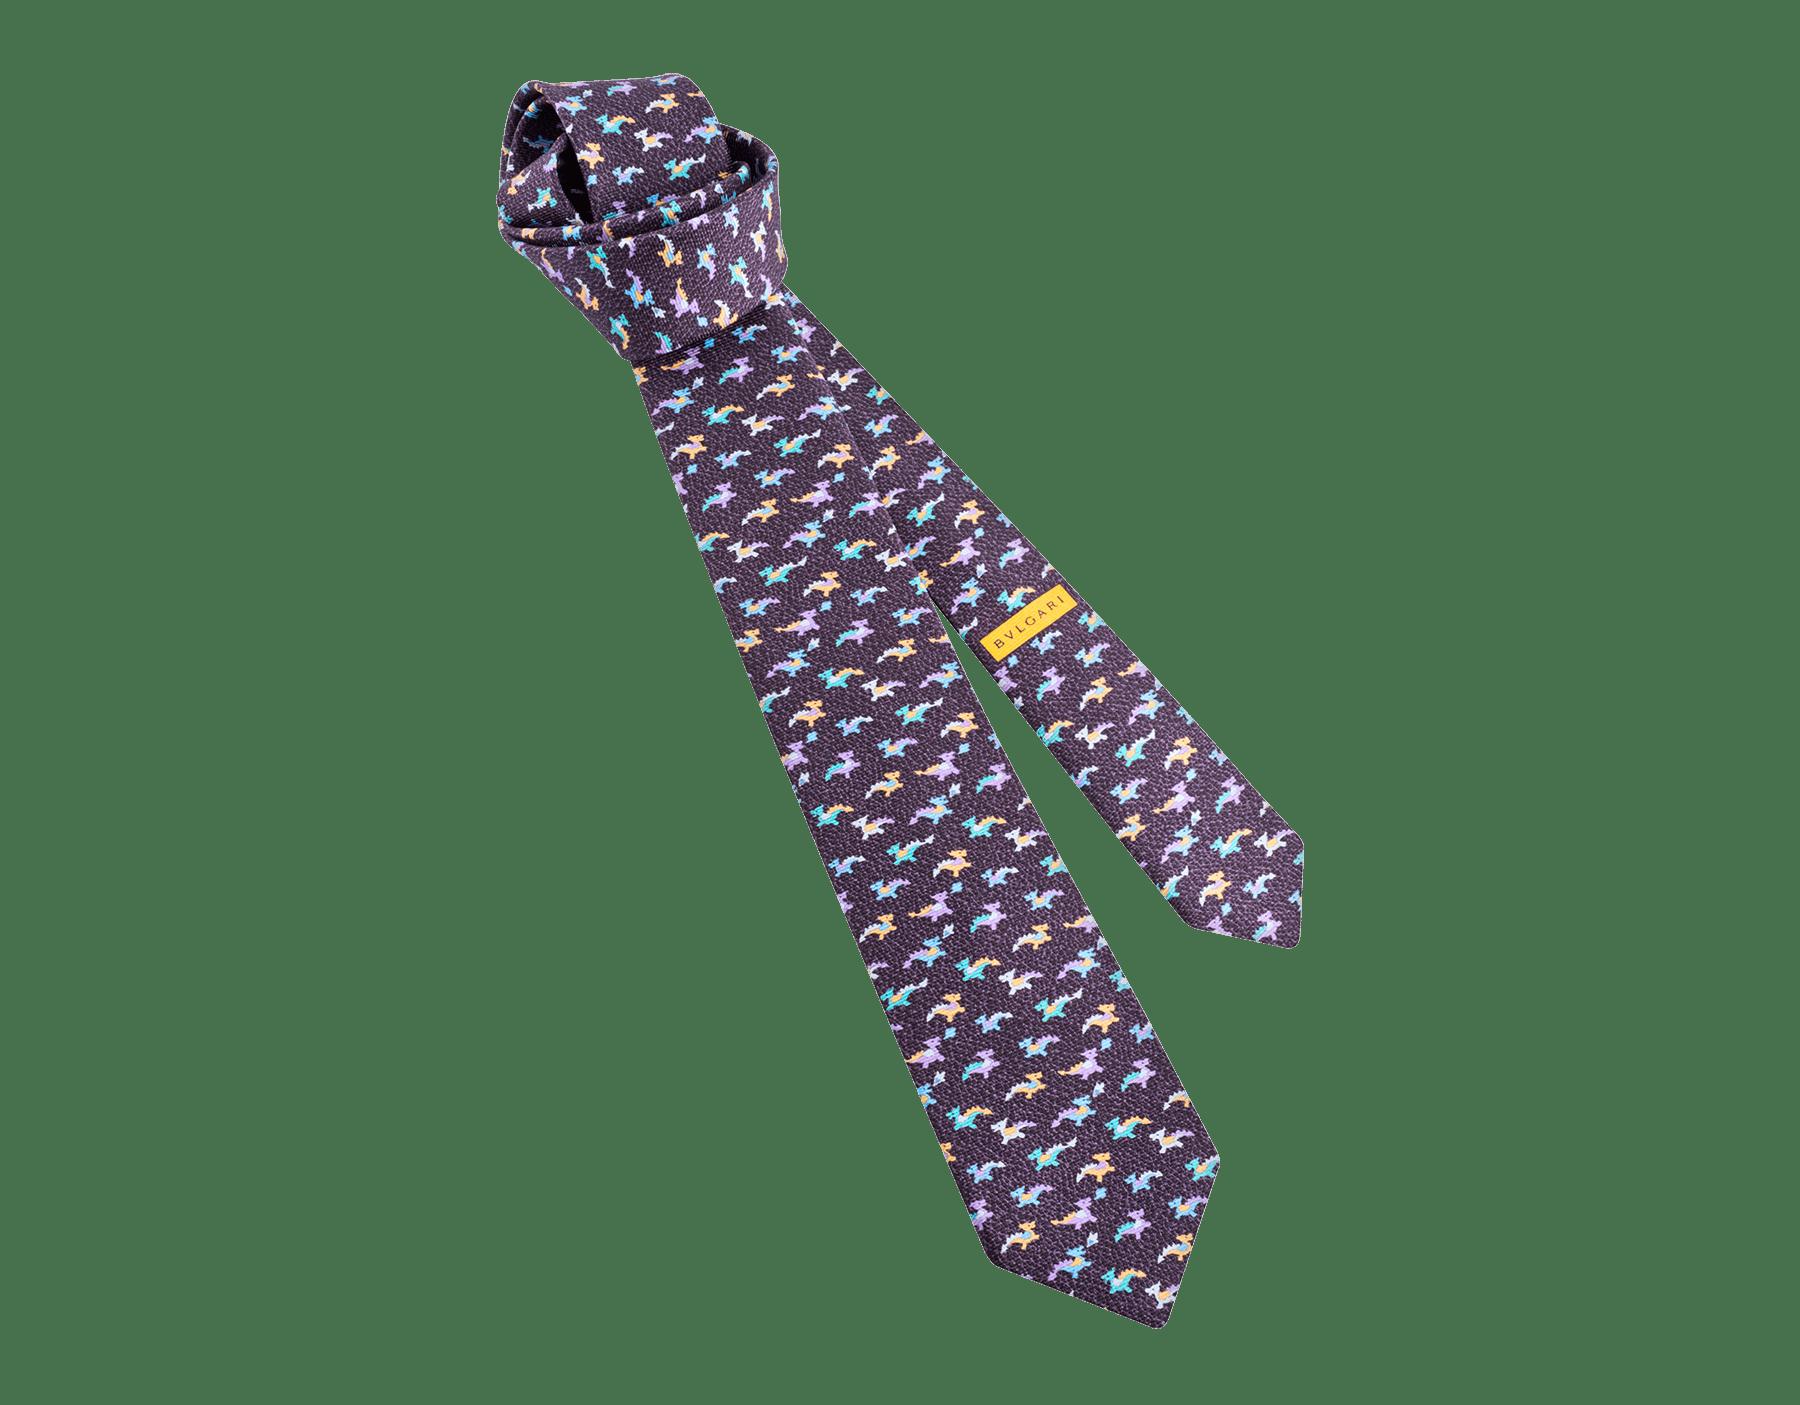 Mauve Dragonheart pattern seven-folds tie in fine saglione printed silk. 243632 image 1